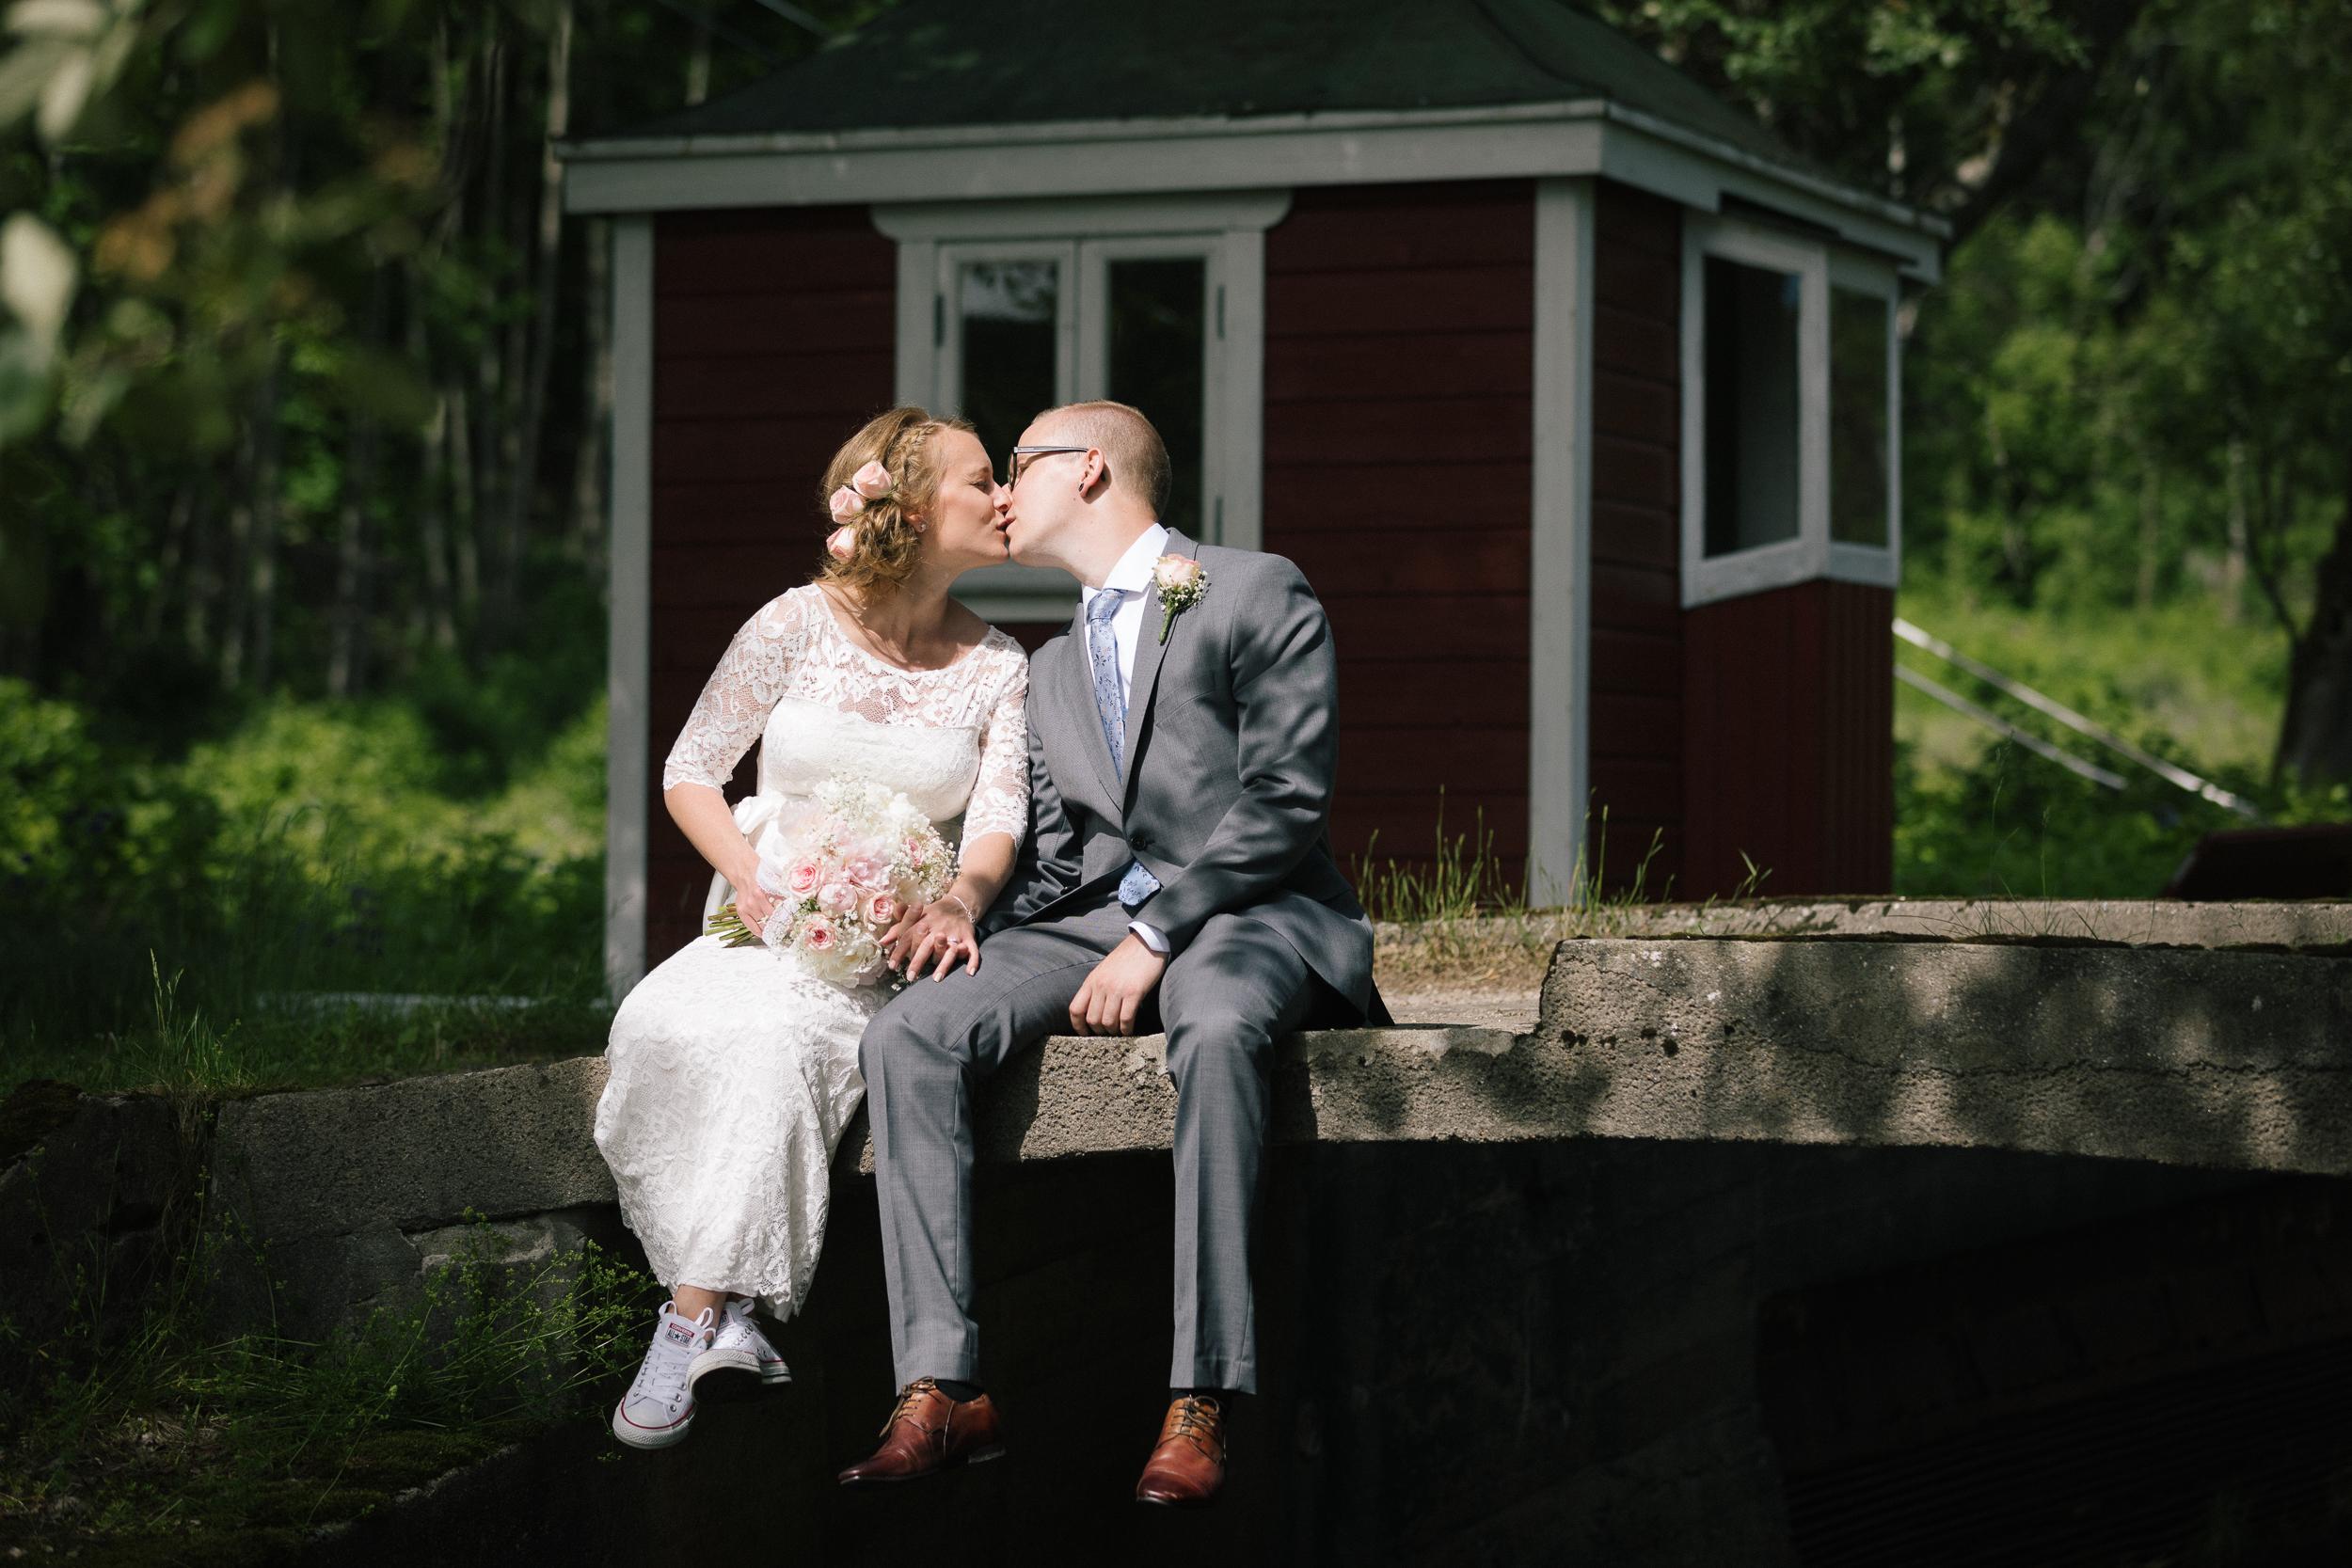 bryllup-bryllupsfotografering-bryllupsfotograf-sarpsborg-20170617-_H2A2720anneli_phillip.jpg